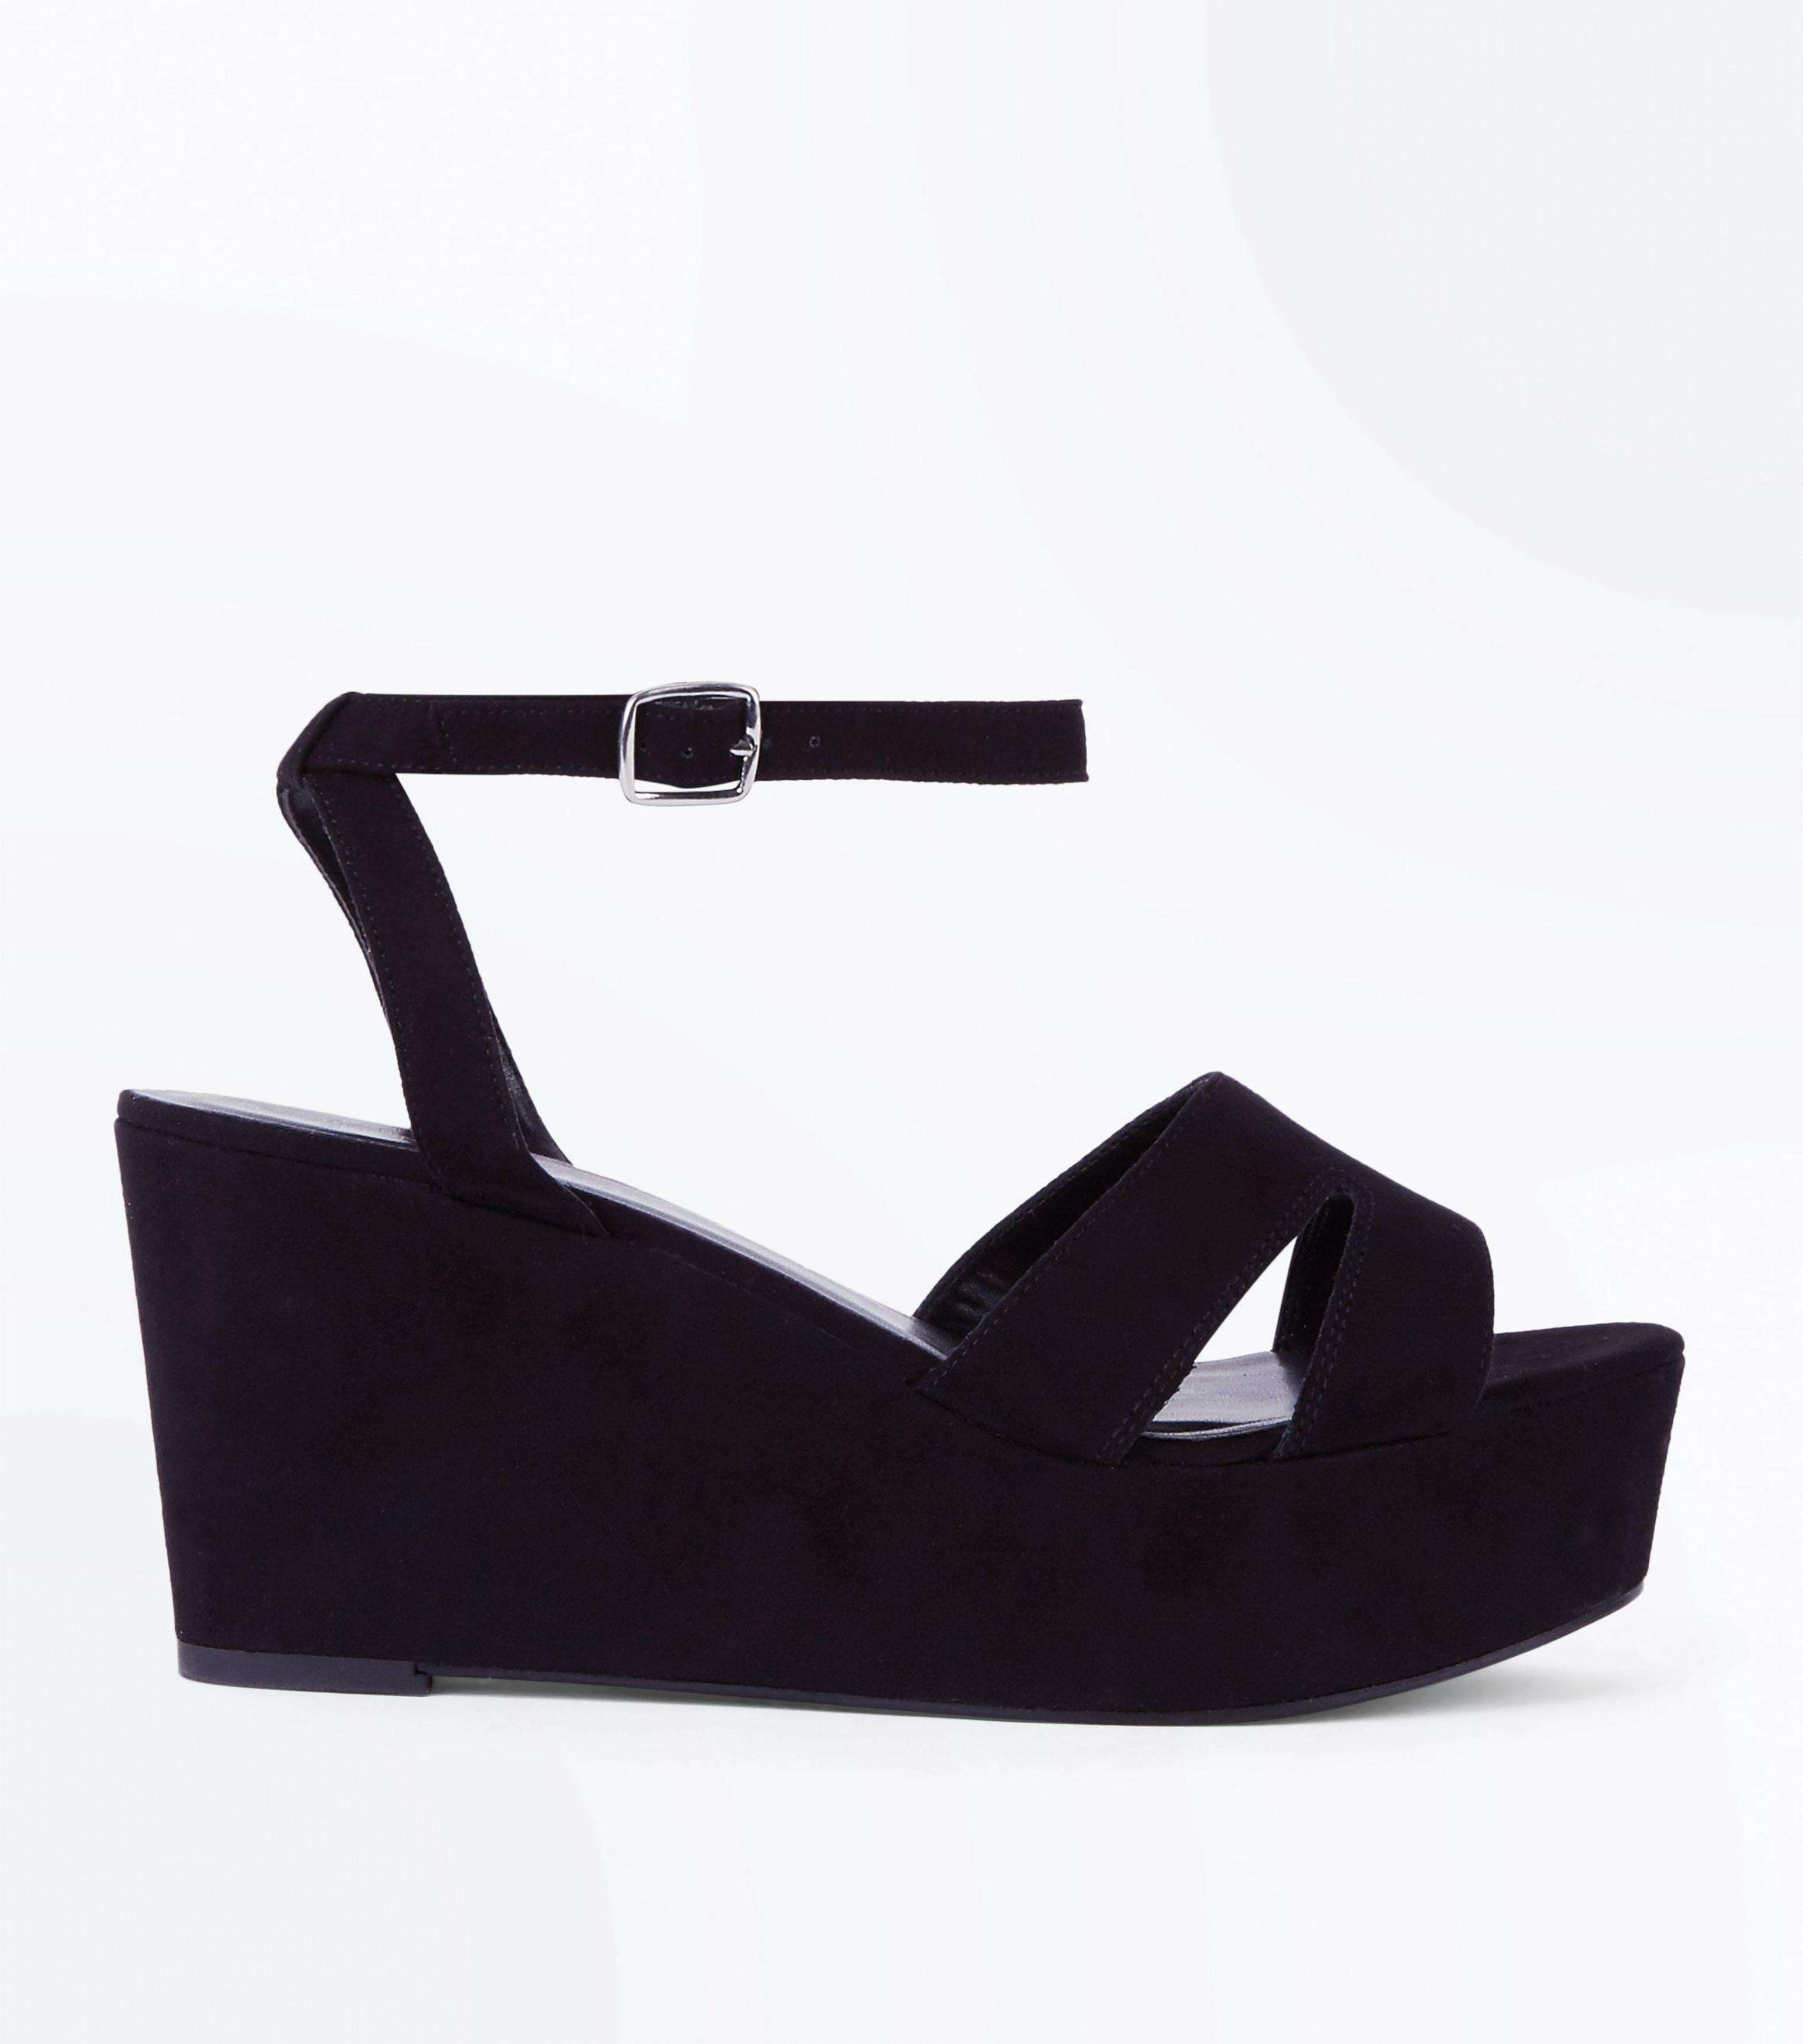 aa14c93e3b1 New Look Wide Fit Black Suedette Flatform Wedge Sandals in Black - Lyst